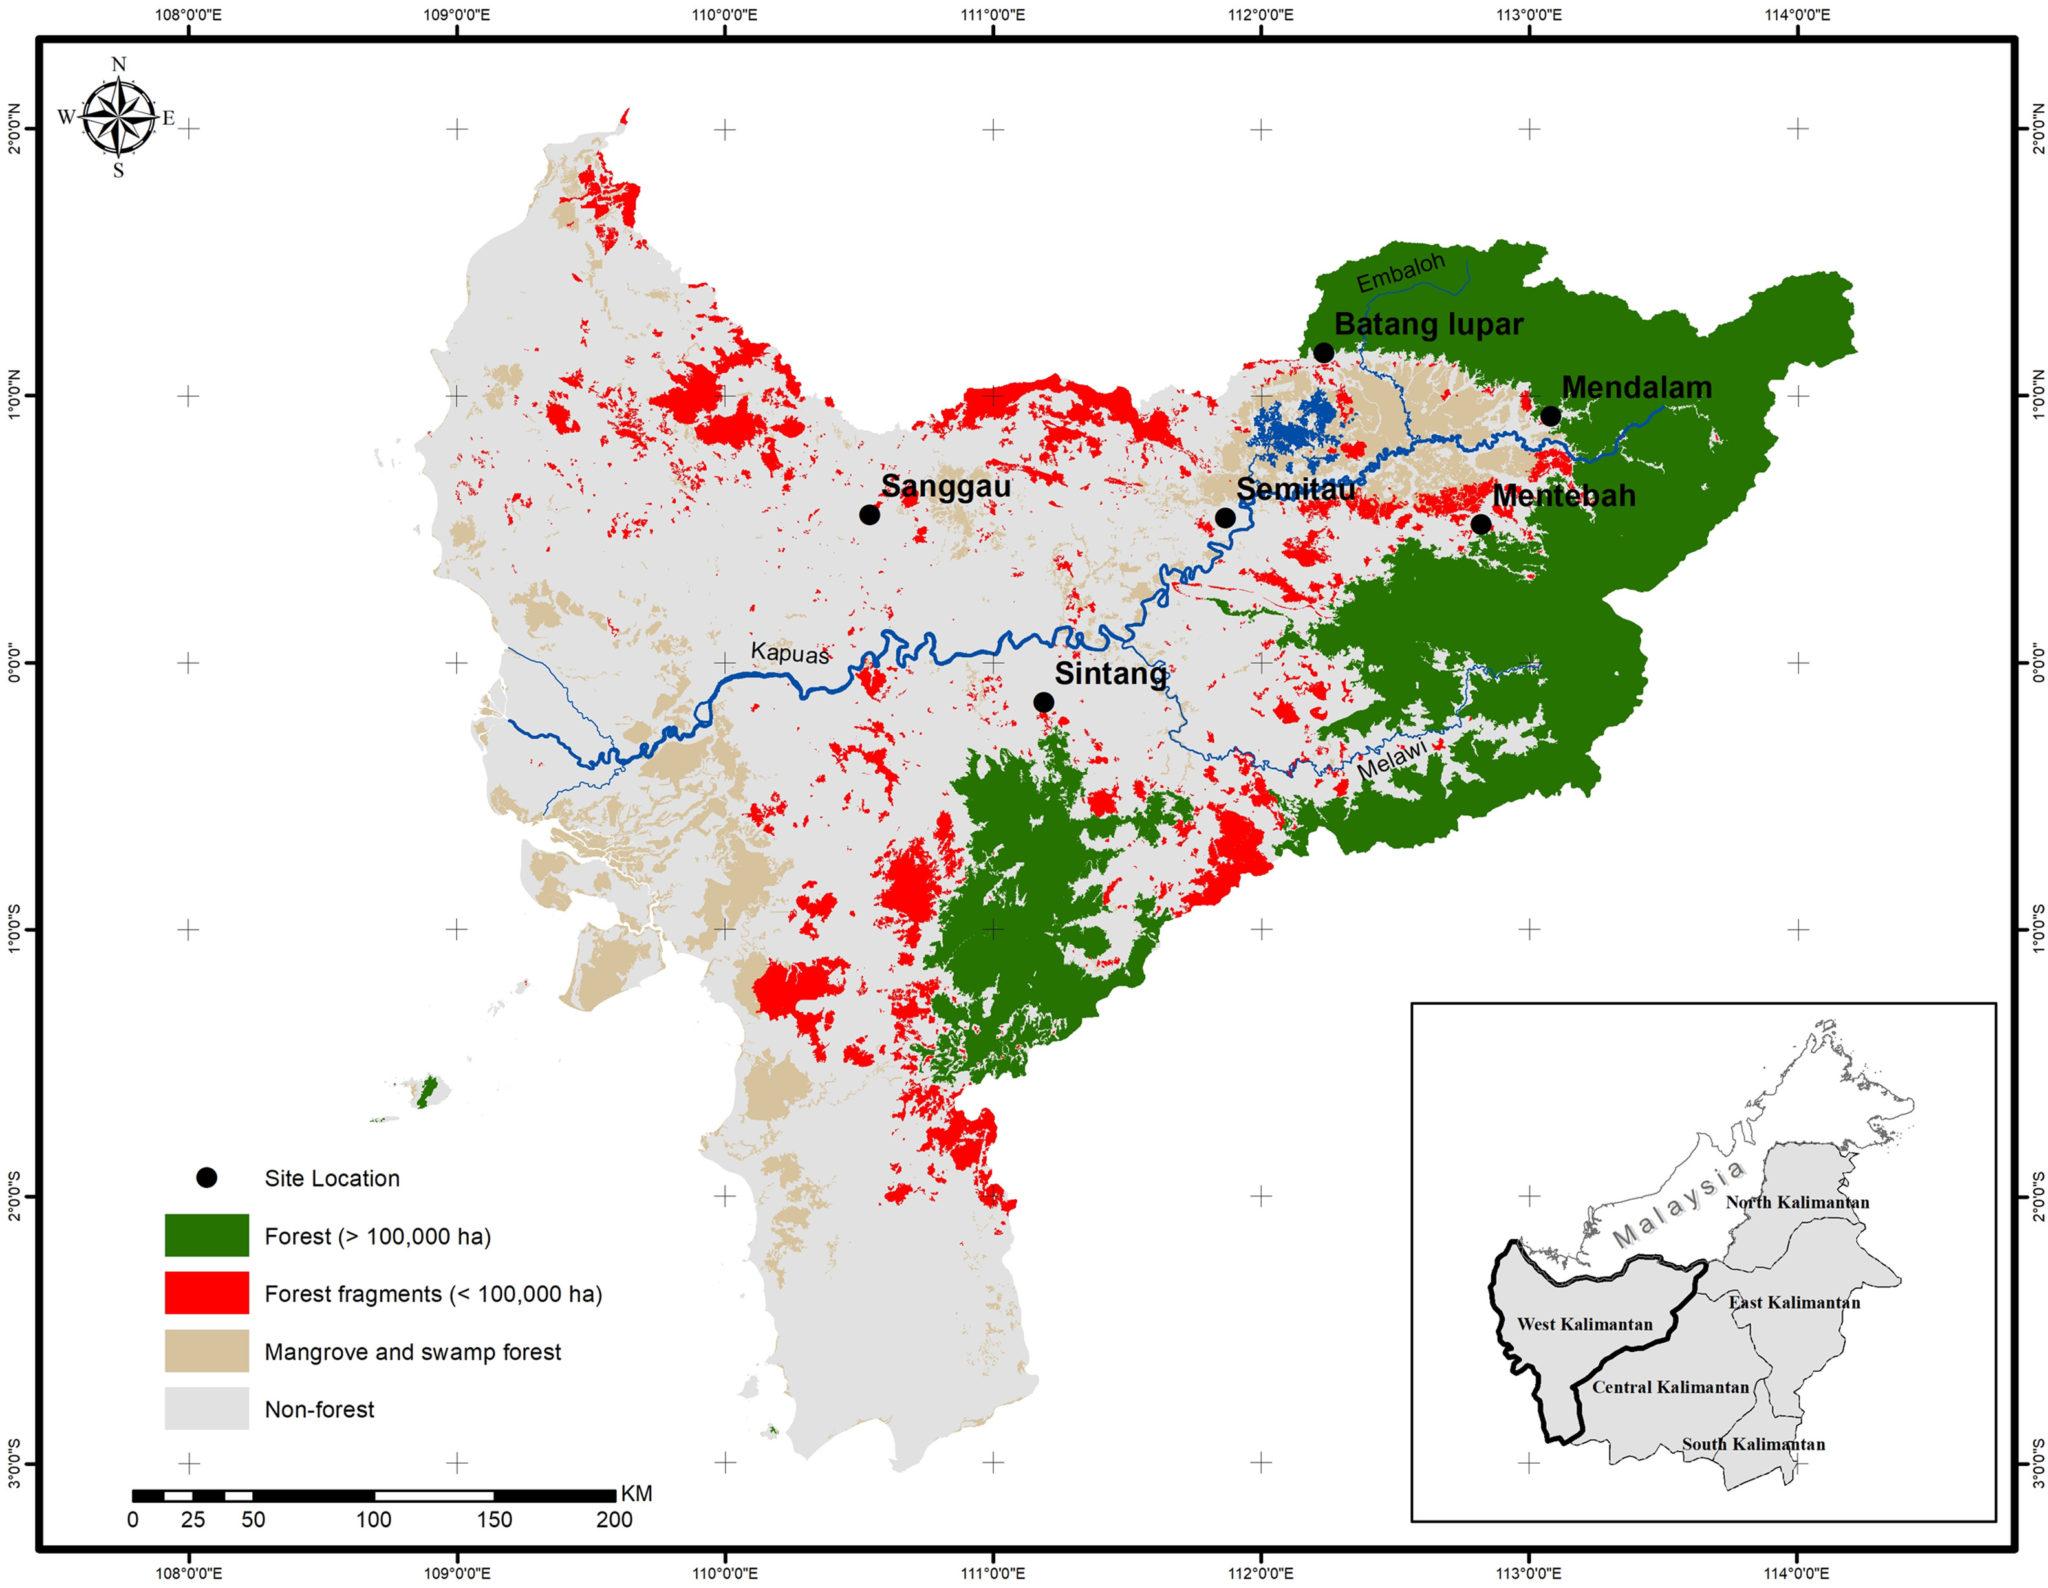 Sampled sites in West Kalimantan province for the study. Image courtesy of Simamora et al. (2021).